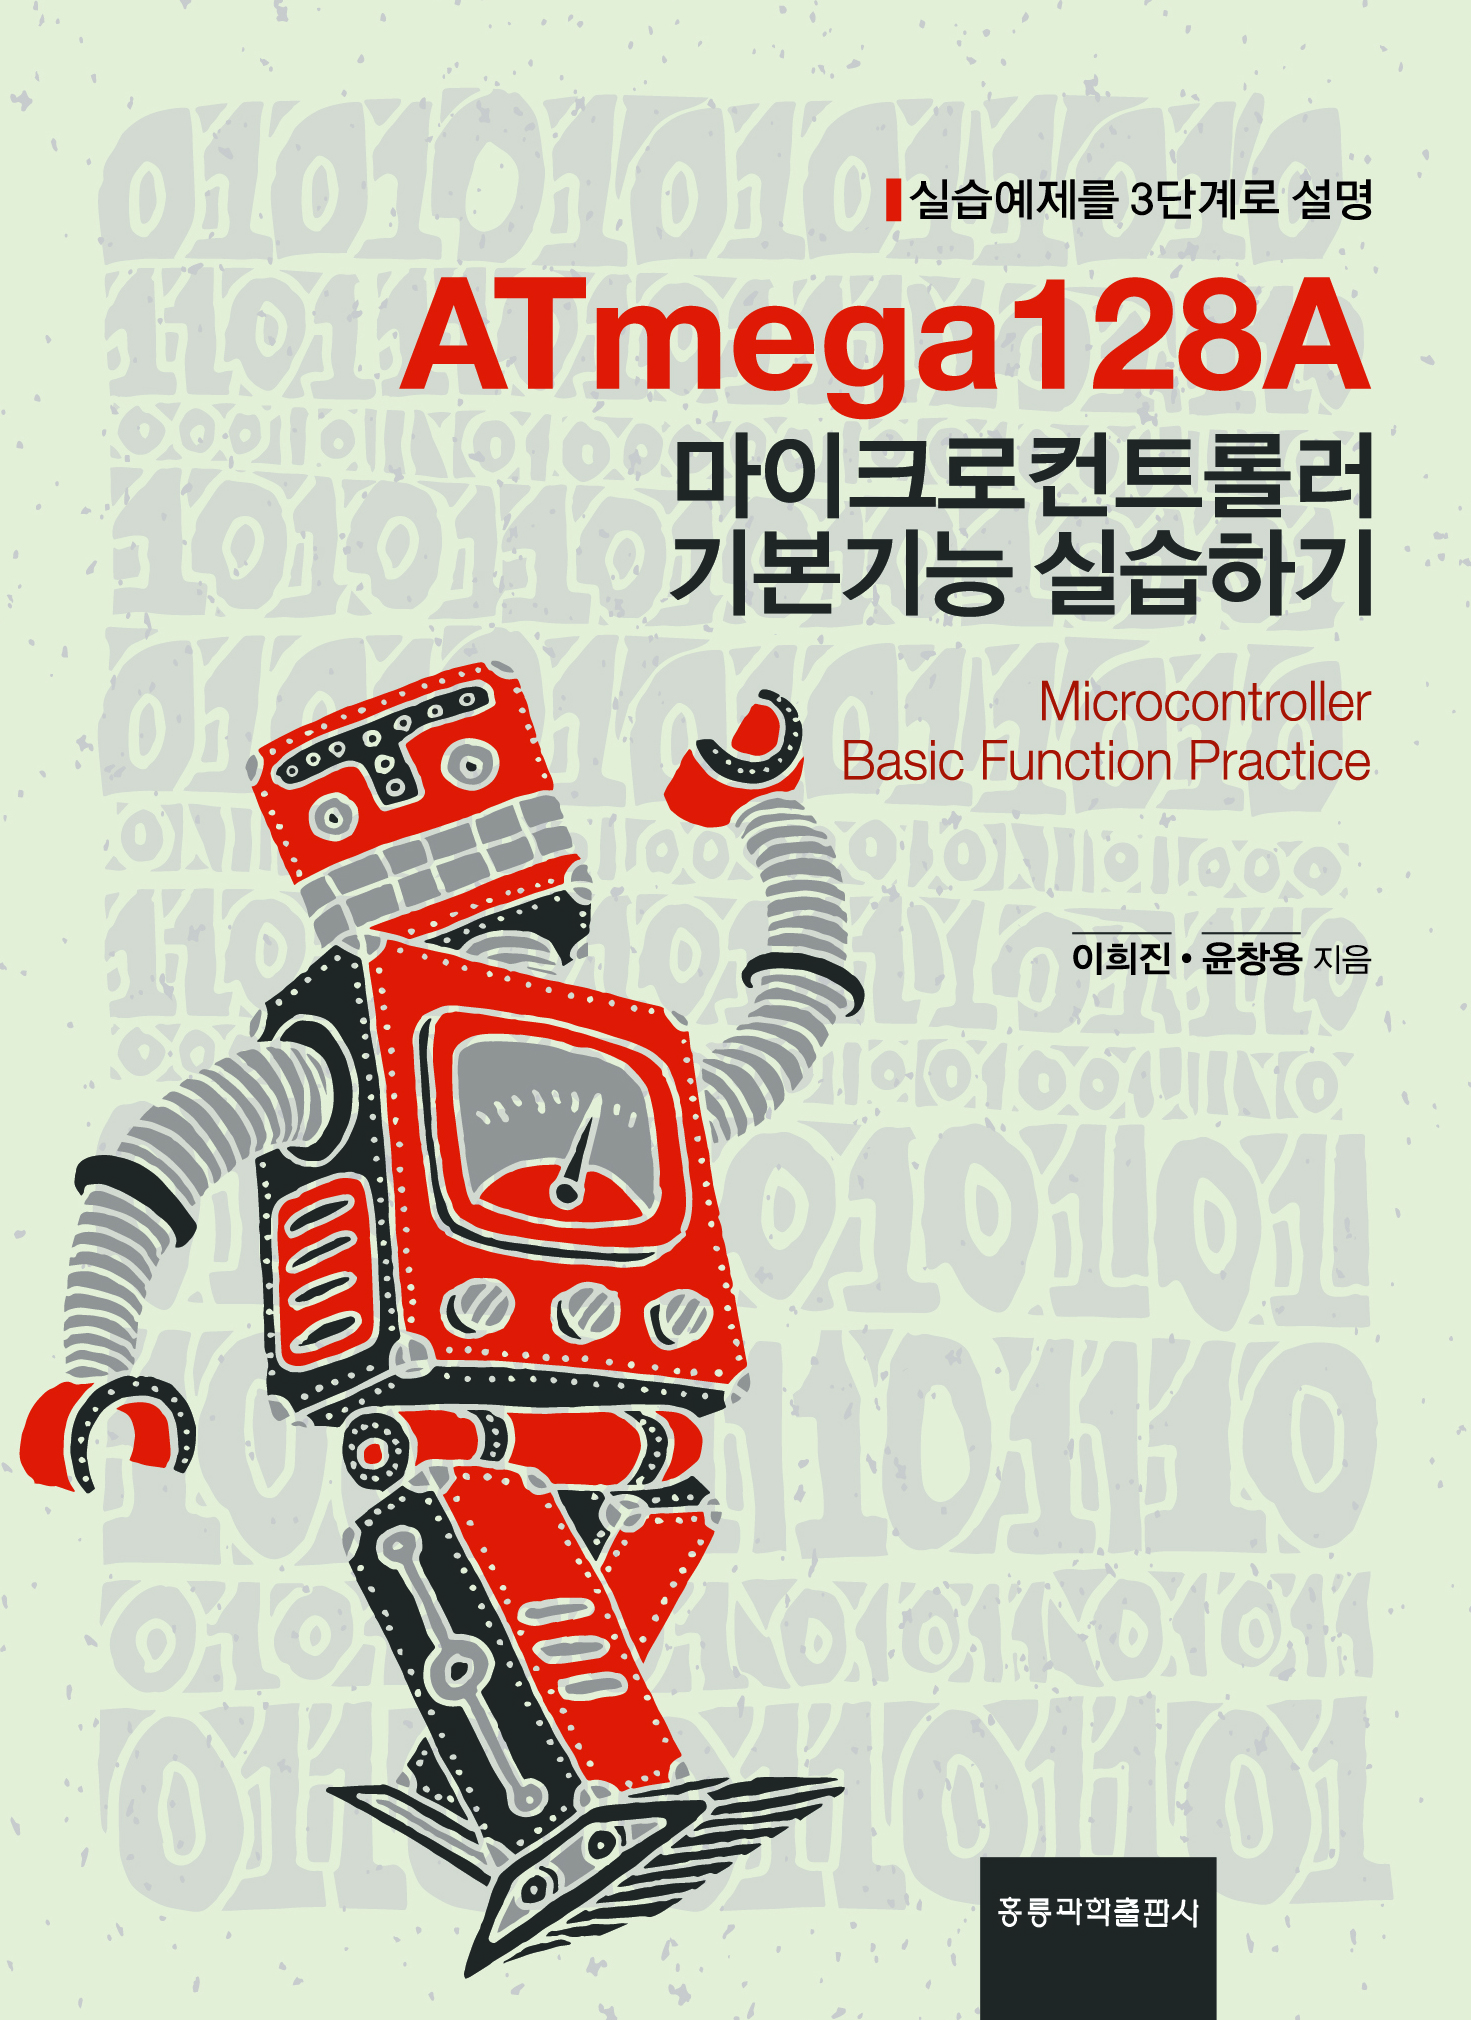 ATmega128A 마이크로컨트롤러 기본기능 실습하기